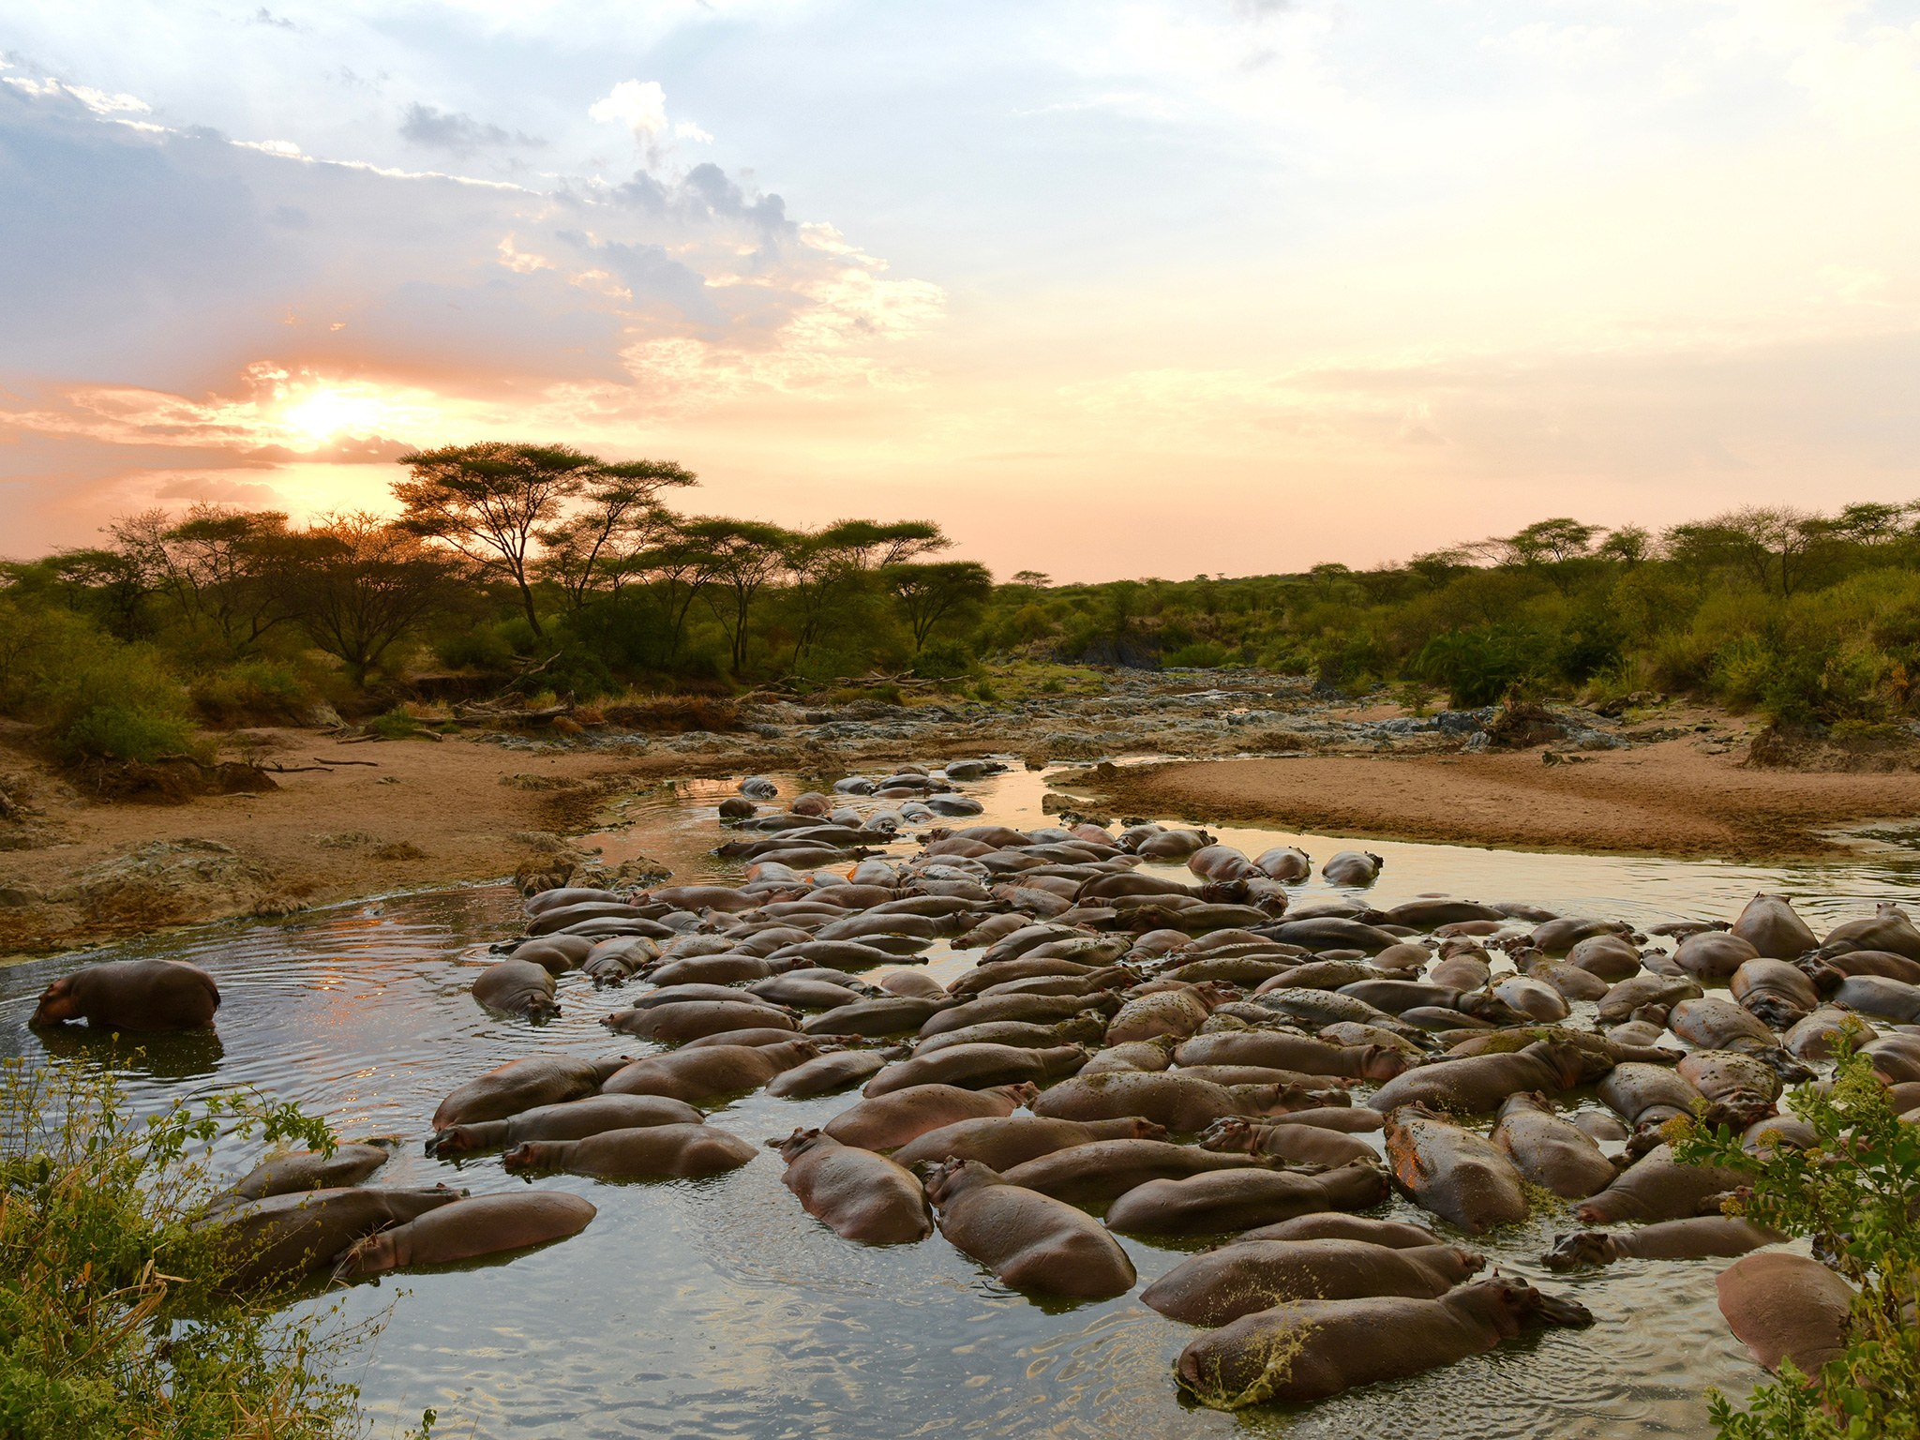 7. Бегемоты – Танзания.